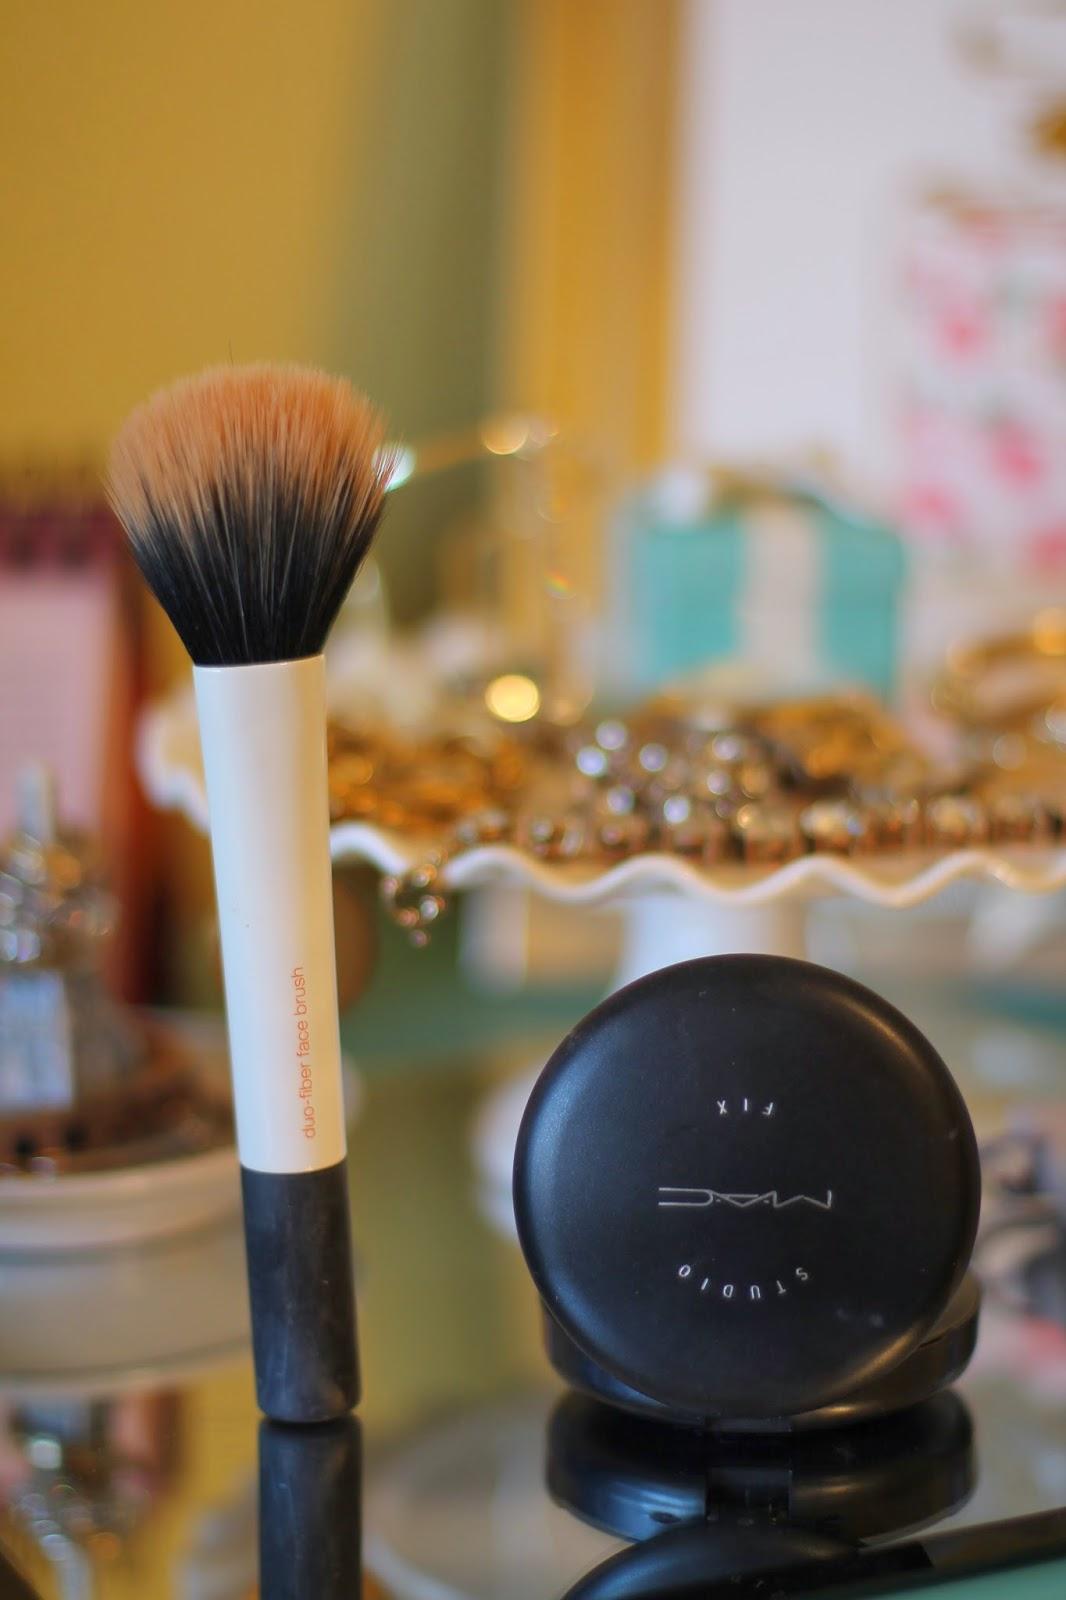 www.TheSweetestThingBlog, Emily Gemma, Makeup, MAC cosmetics, Mac Studio Fix Powder, Makeup Review, Mac Bronzer, Mac Blush, Better than Sex Mascara, Revlon Eye Liner, Make up brushes, Mac makeup brushes, Makeup Brush Holder, Monogram Makeup Brush Holder, Tarte Makeup Brush, Mac Eye Liner, Mac Foundation, Sephora Make up brush, Concealer, Tarte Blush, Mac Lipsticks, Ulta Makeup Brushes, Pinterest Makeup